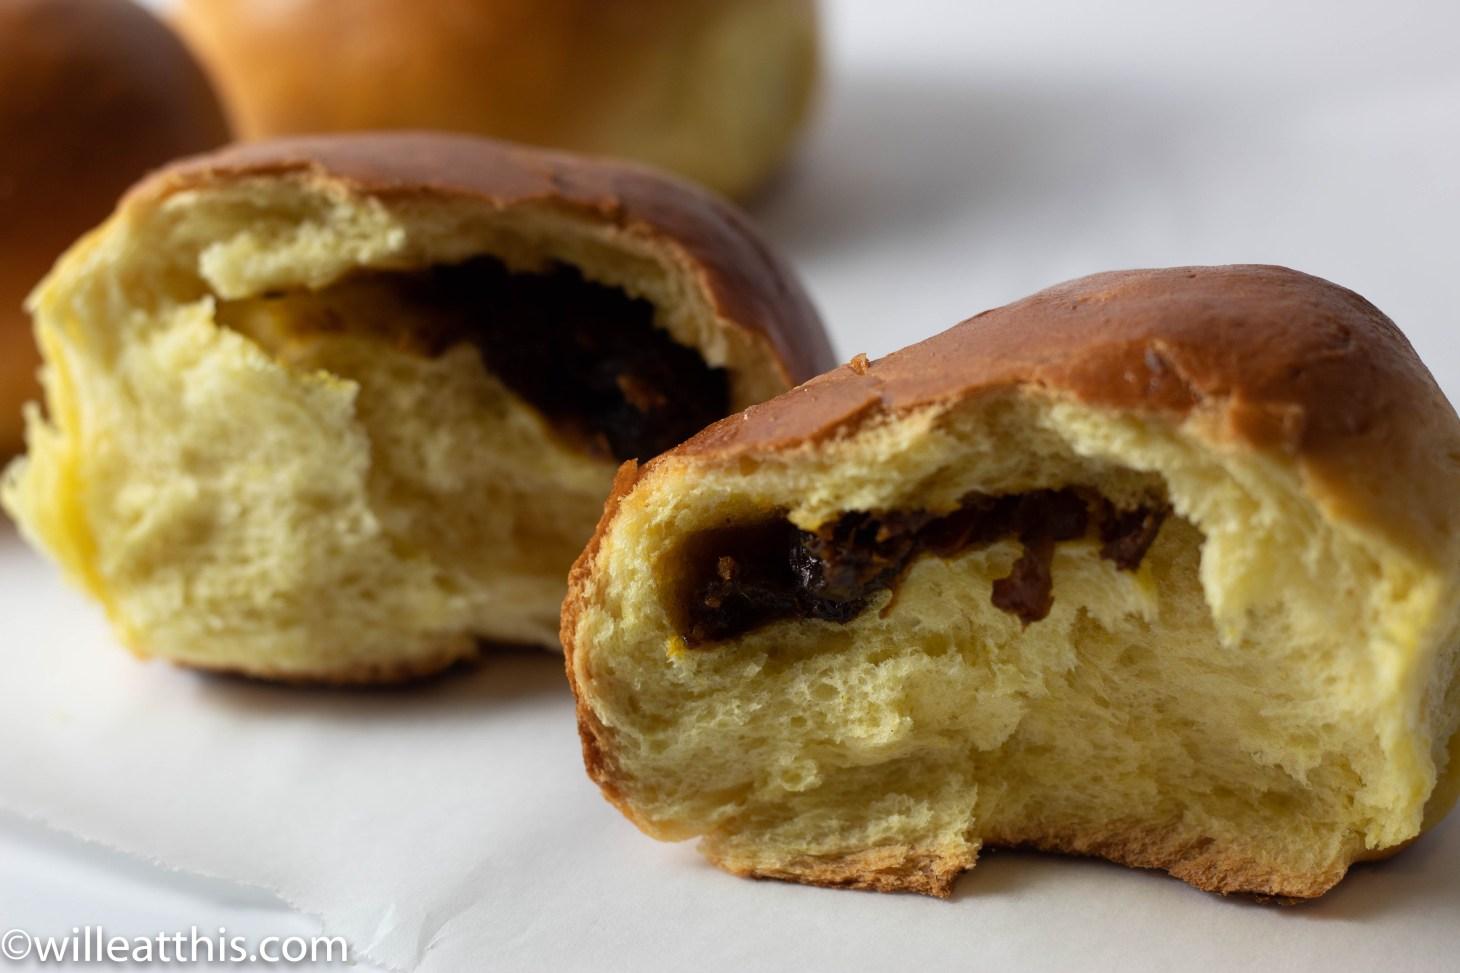 A split tumeric bun stuffed with raisin